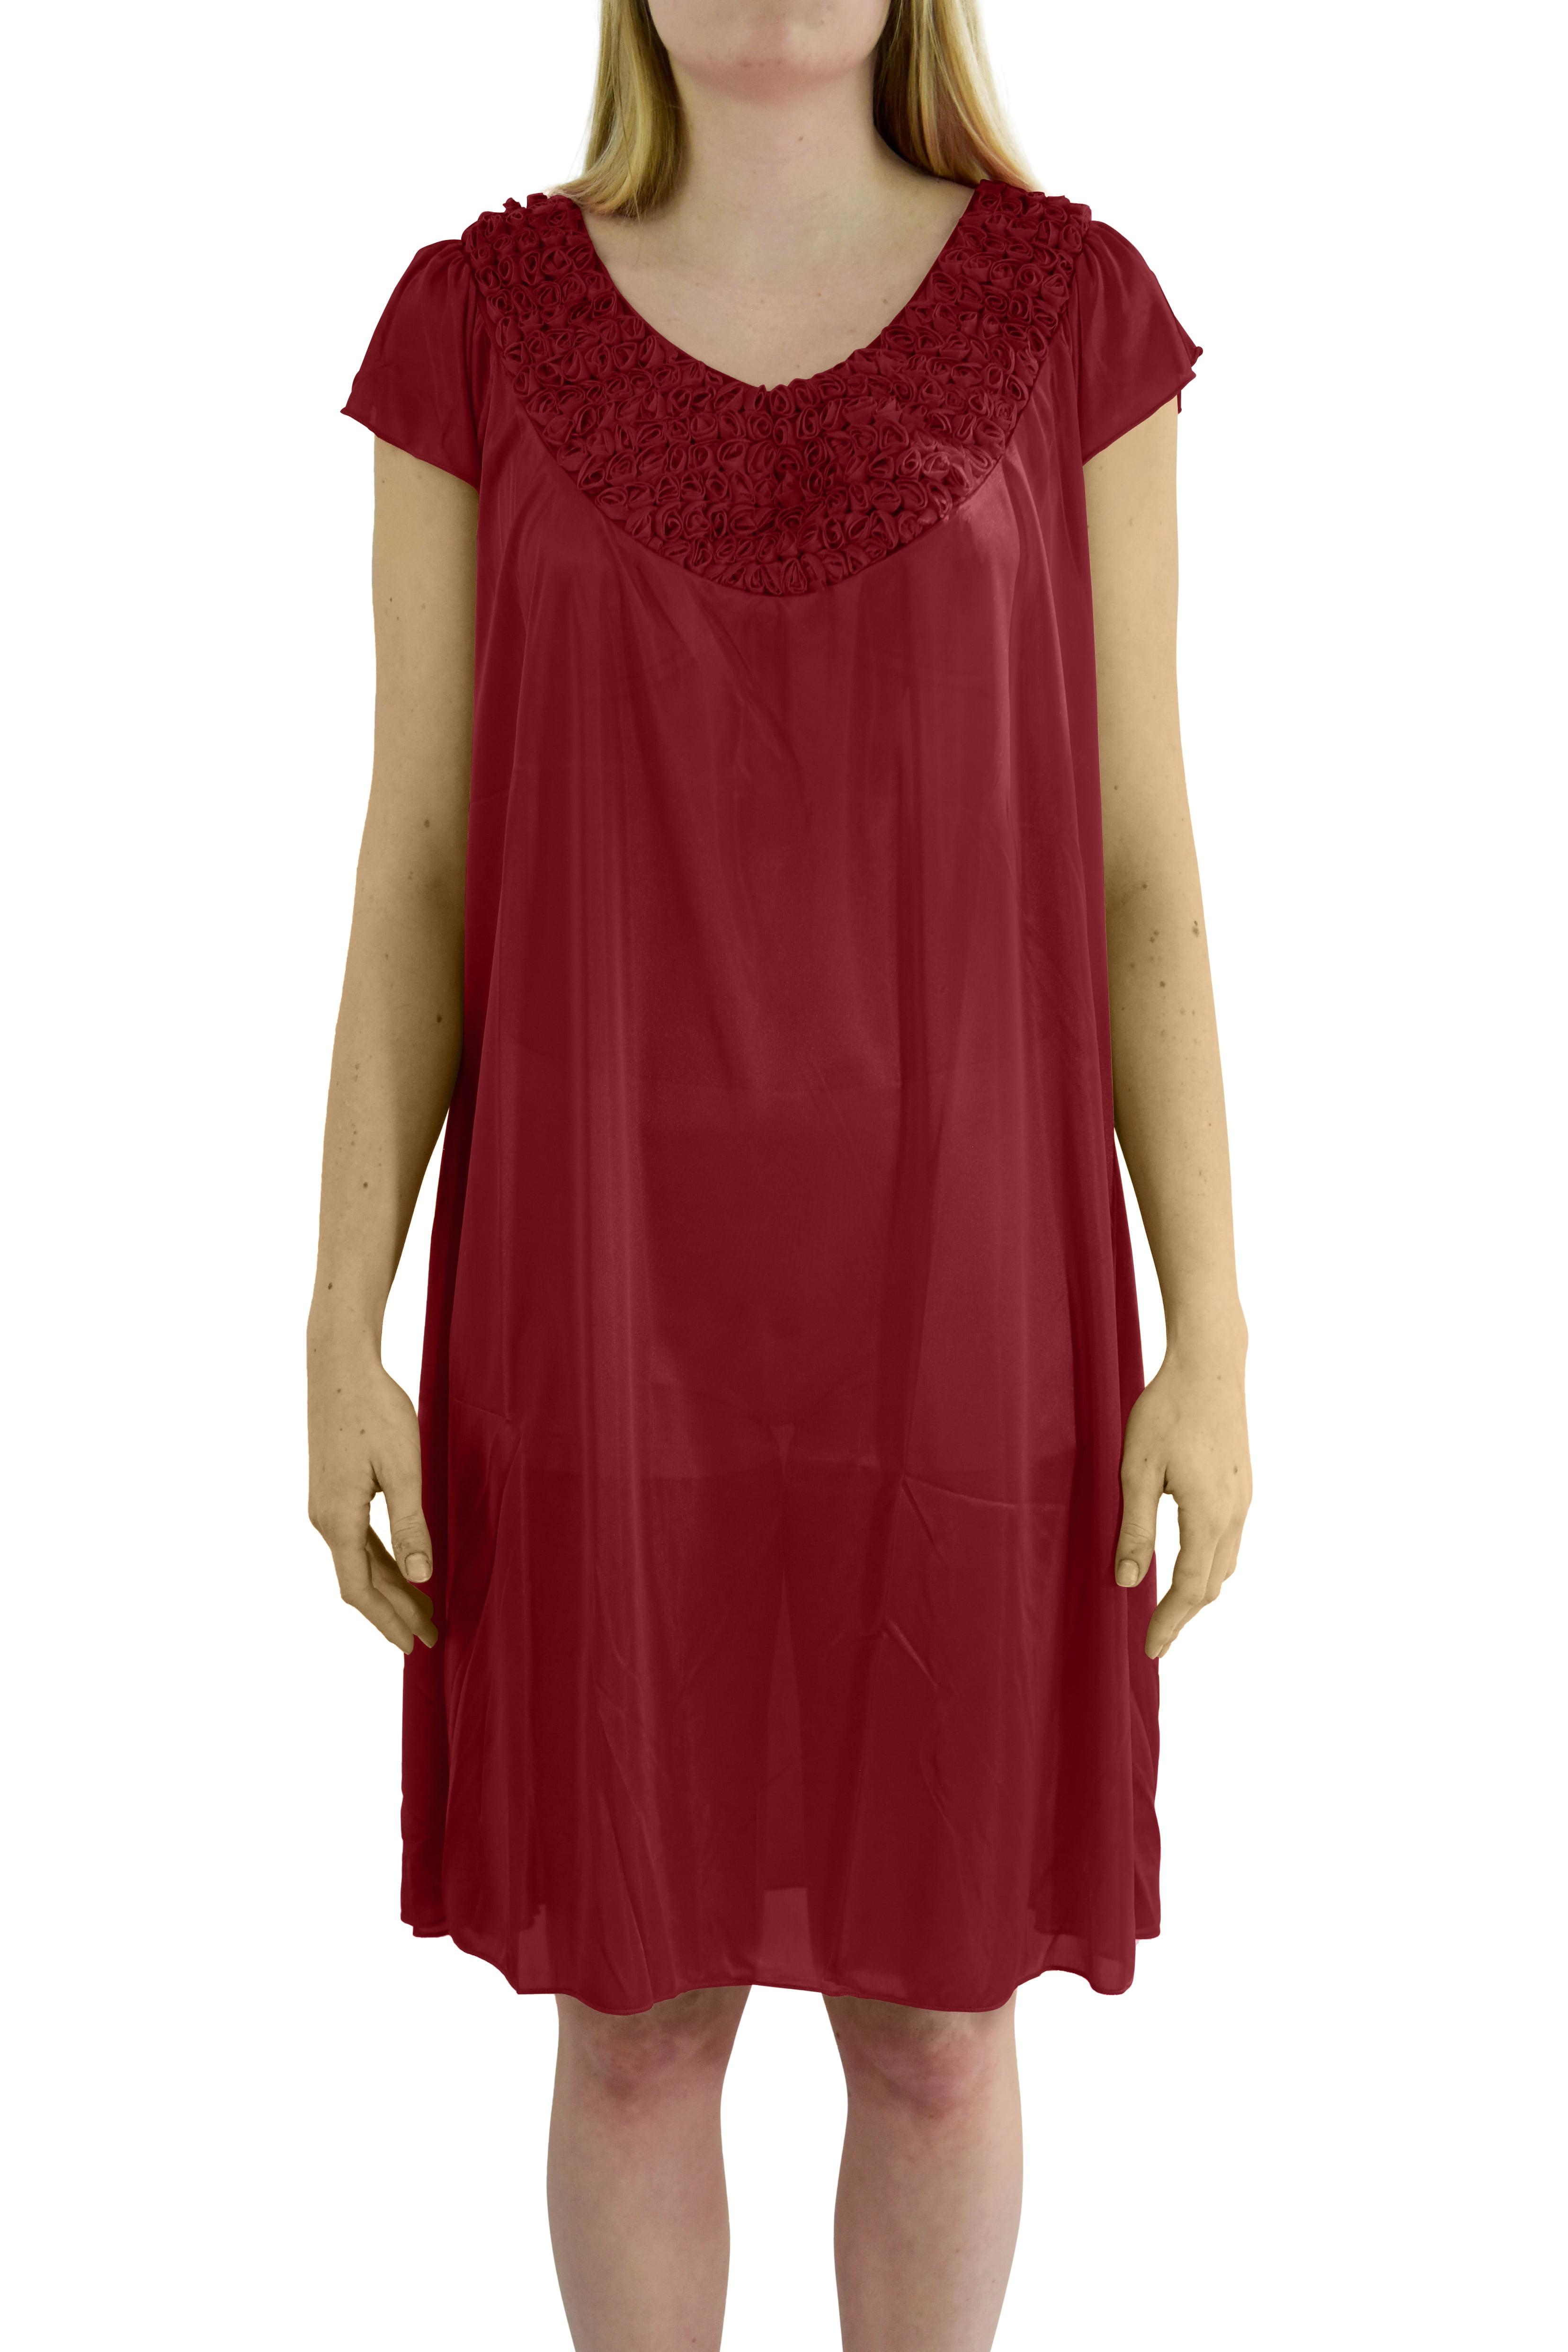 EZI Women's 'Stacy' Cap Sleeve Satin Nightgown